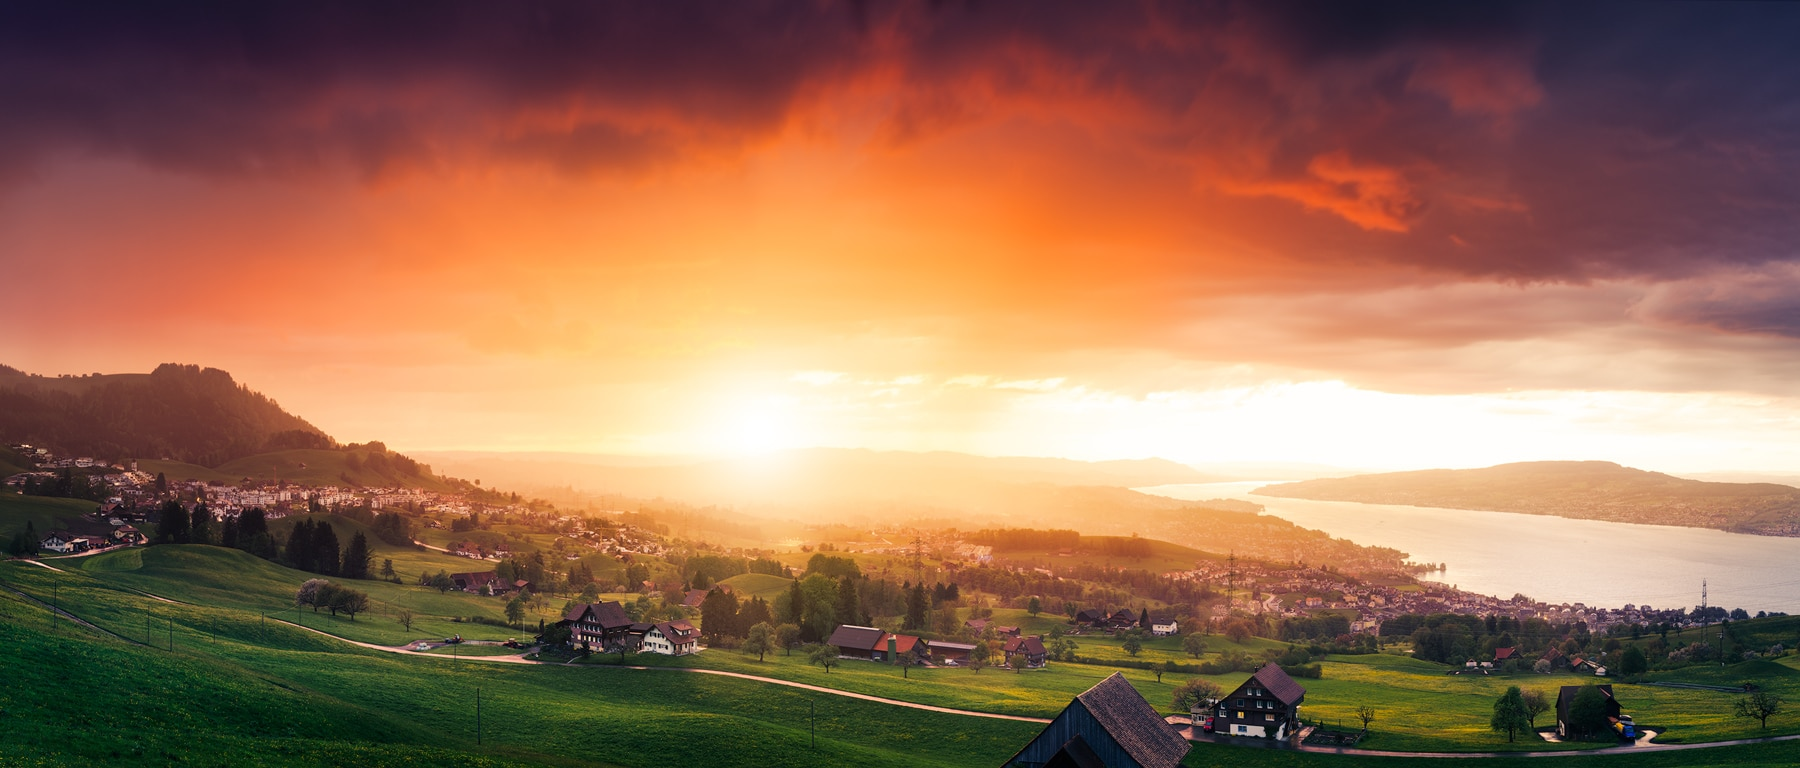 Air-Shots - Schindellegi Sunset Zuerich Lifestyle Immobilien AG Projekt Mirador